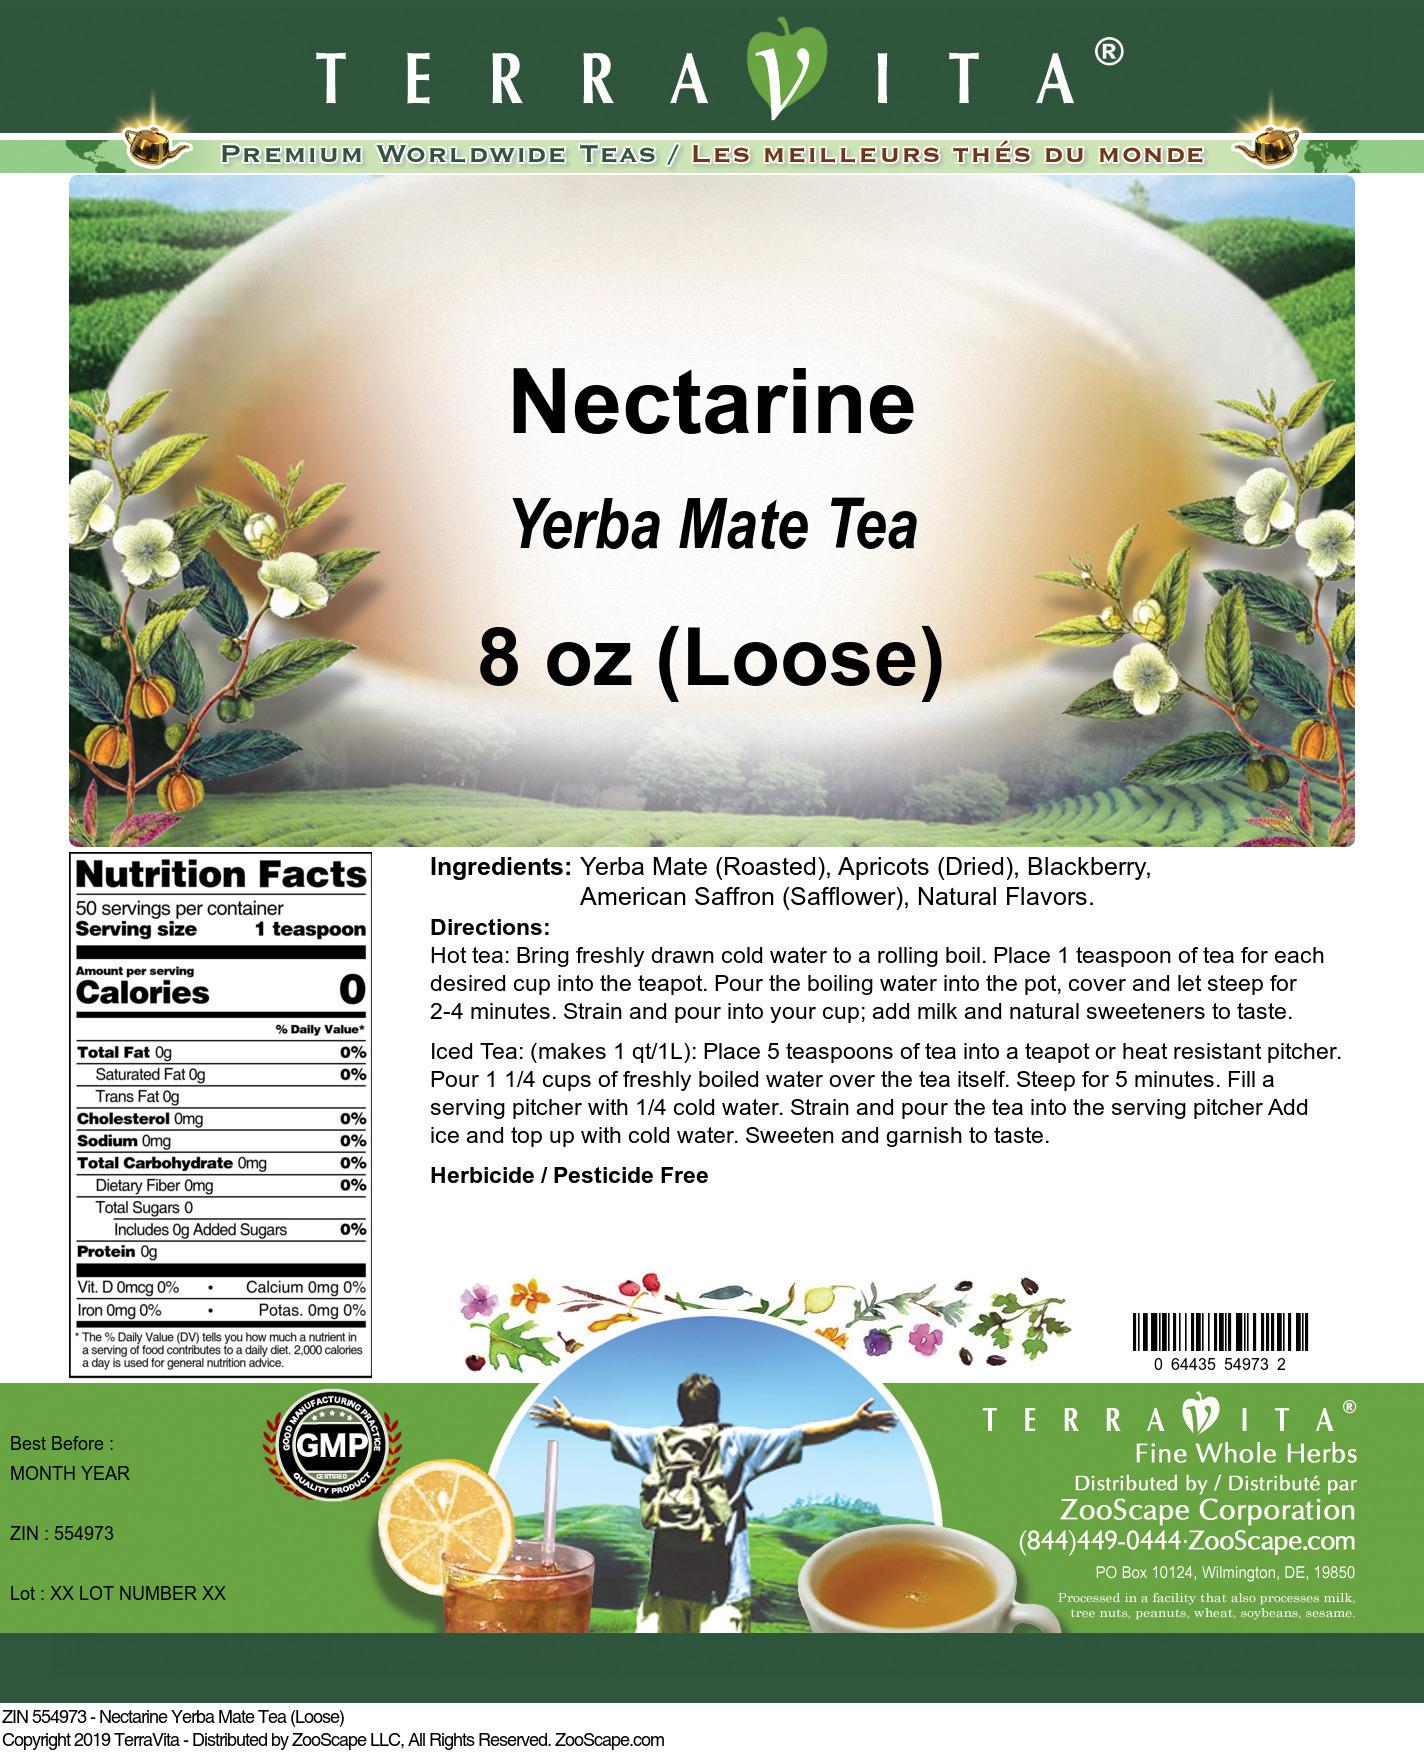 Nectarine Yerba Mate Tea (Loose)